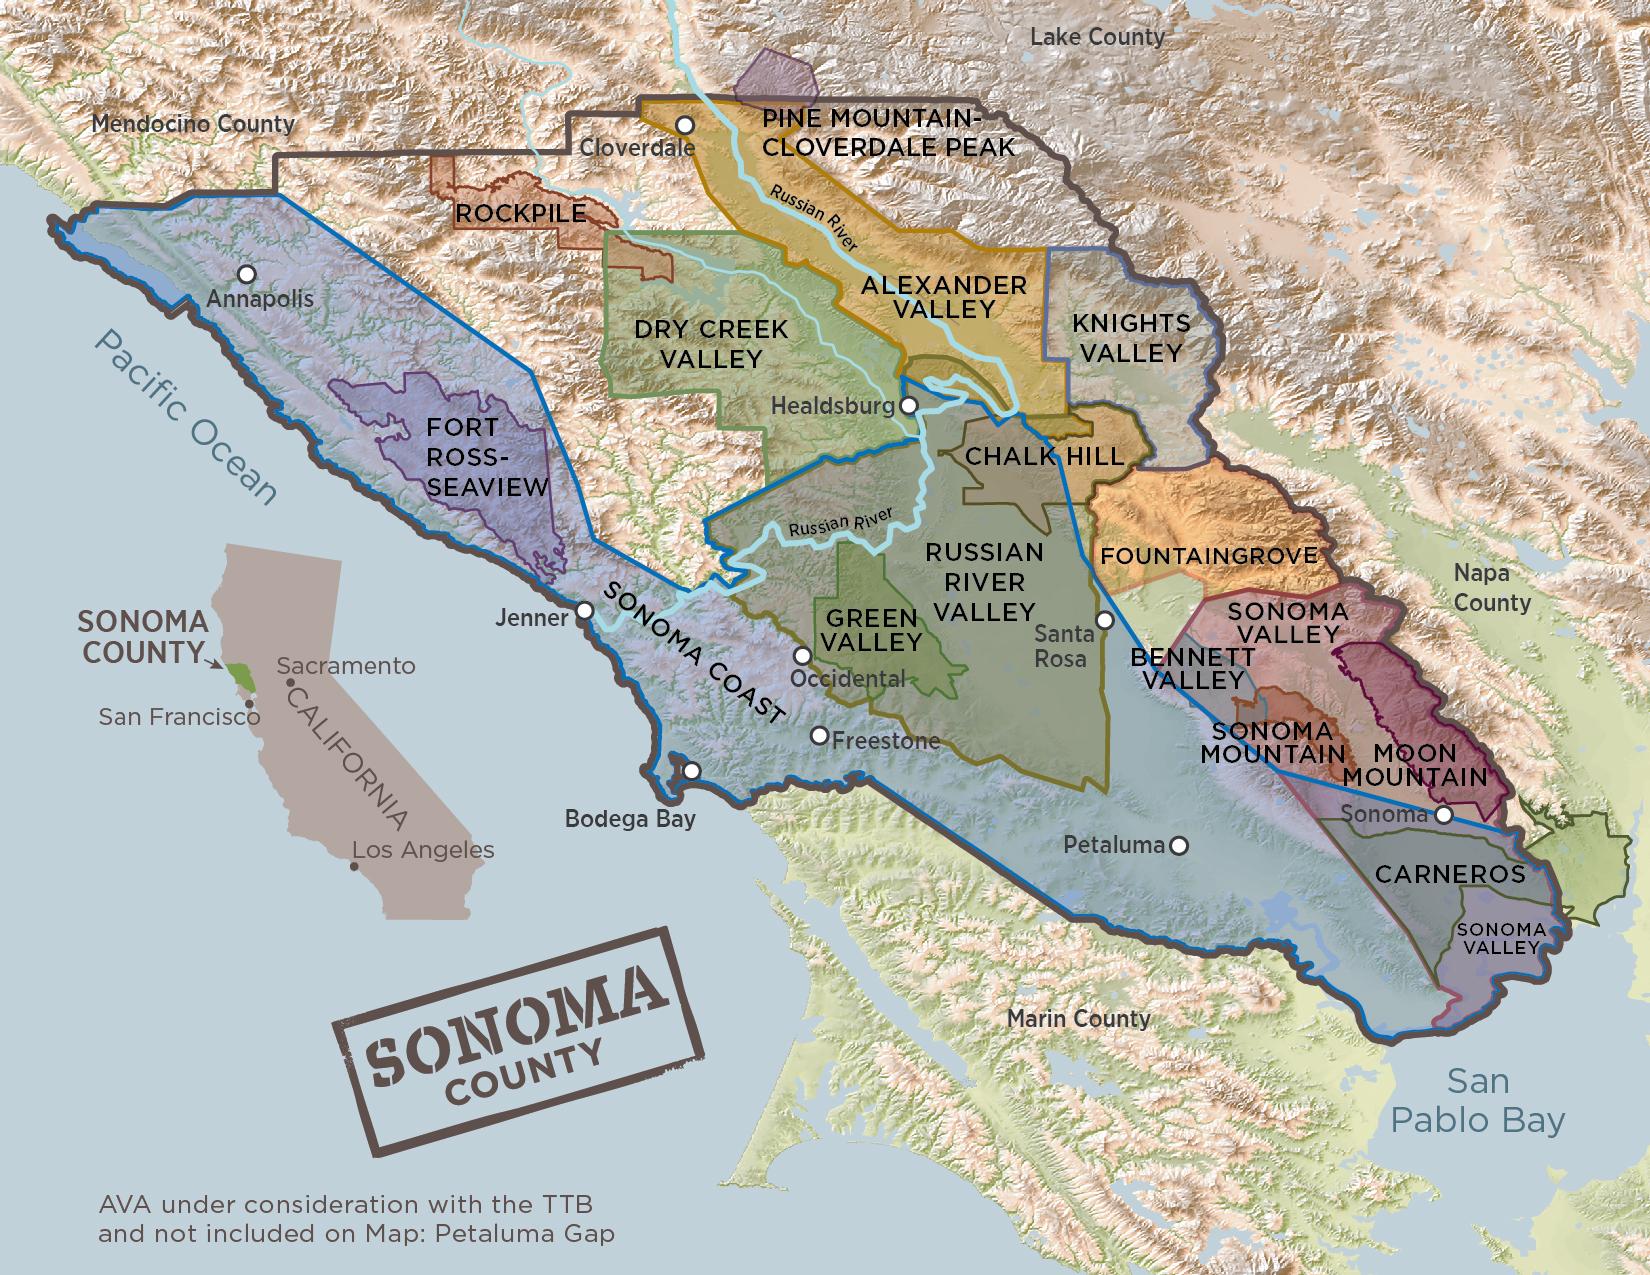 Sonoma County AVAs